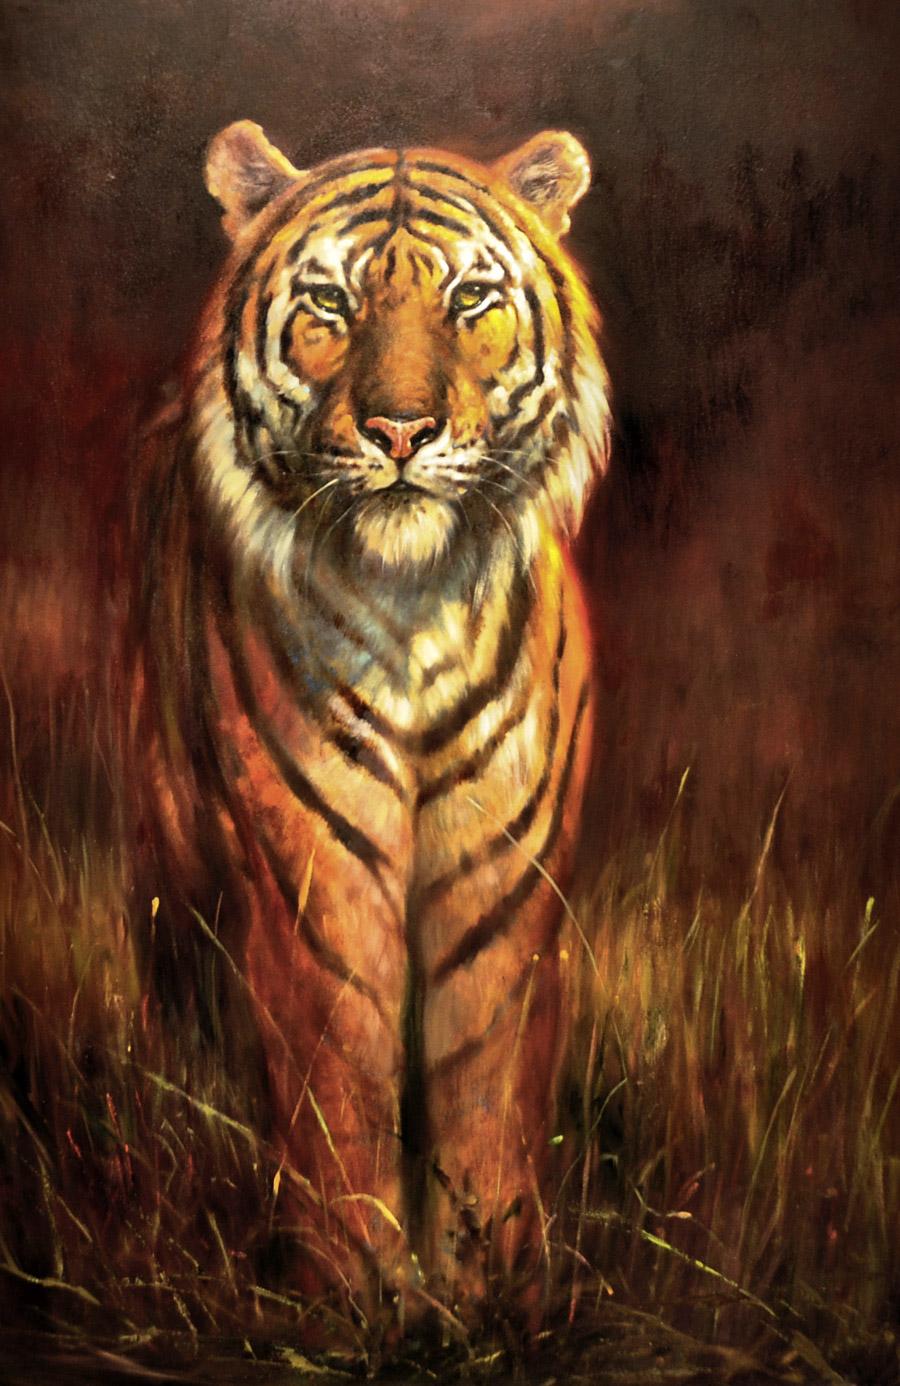 tiger art | bengal shadows |dave merrill